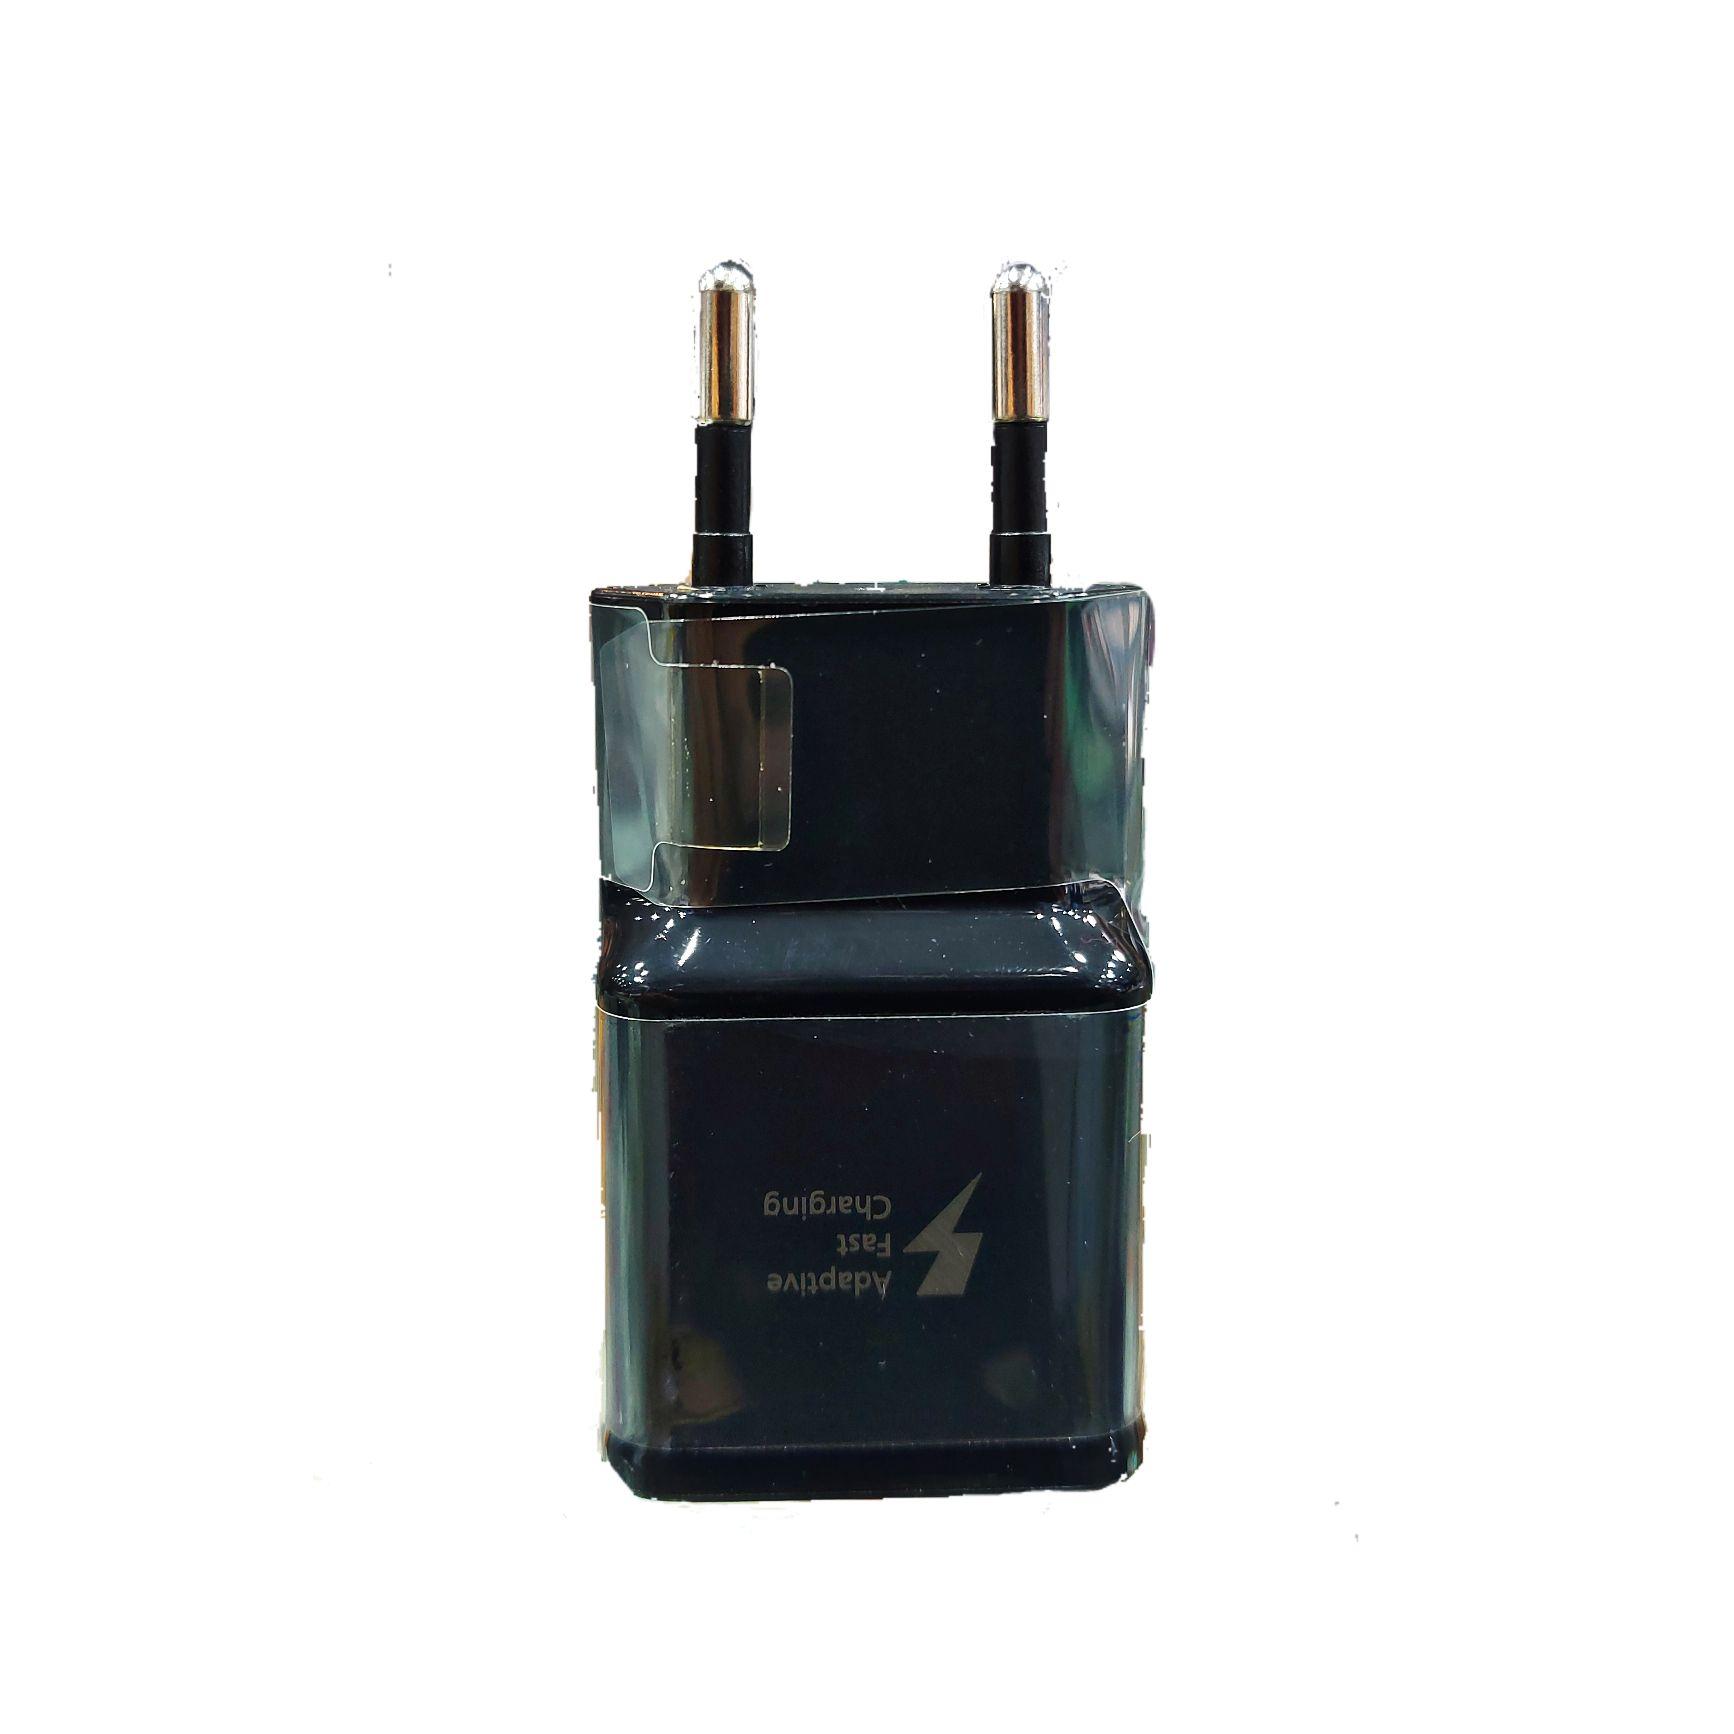 شارژر دیواری  مدل EP-TA300CWE به همراه کابل تبدیل USB-C main 1 2